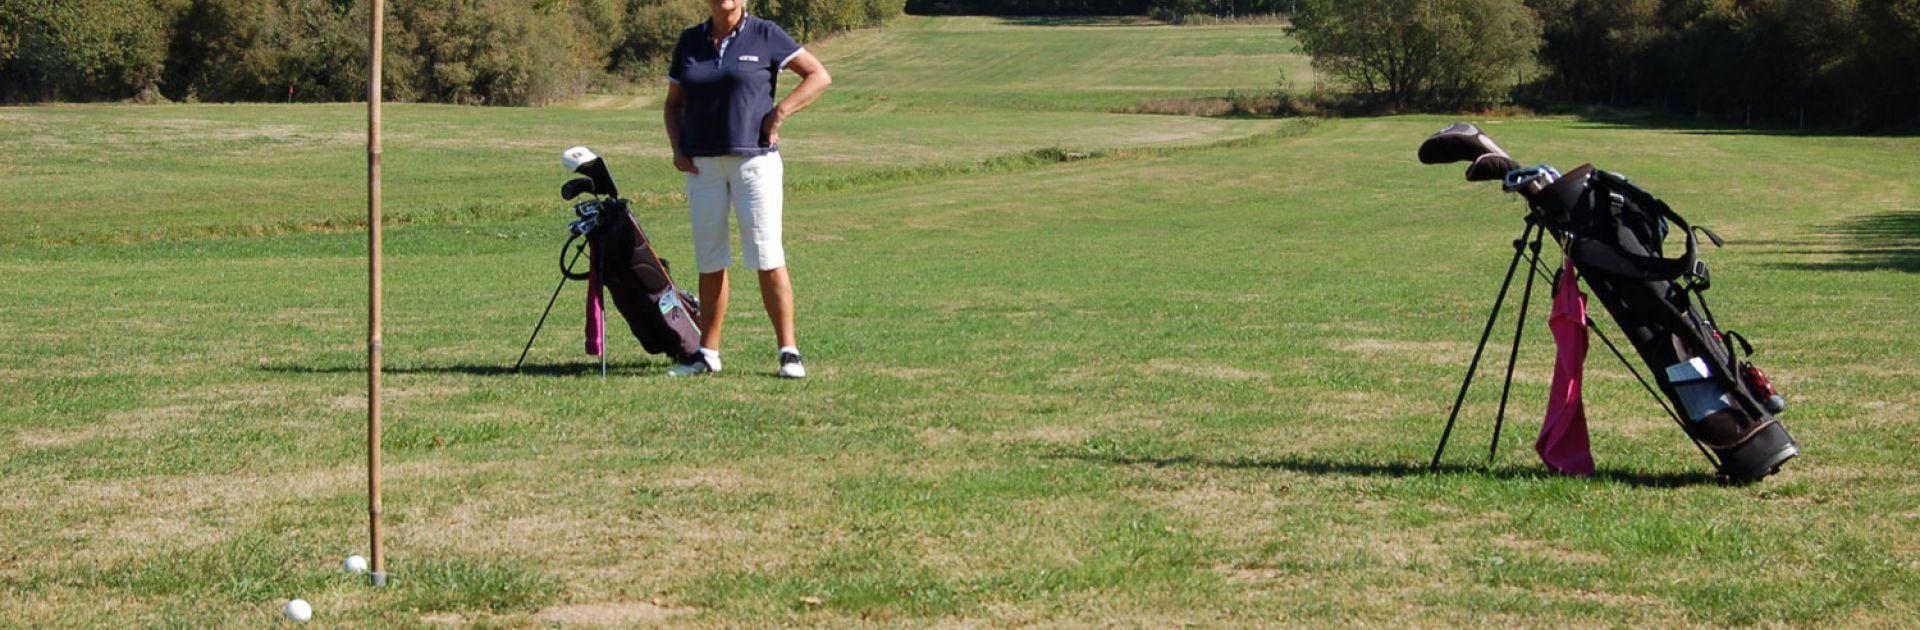 Golf 9 trous Champs Romain Périgord Vert